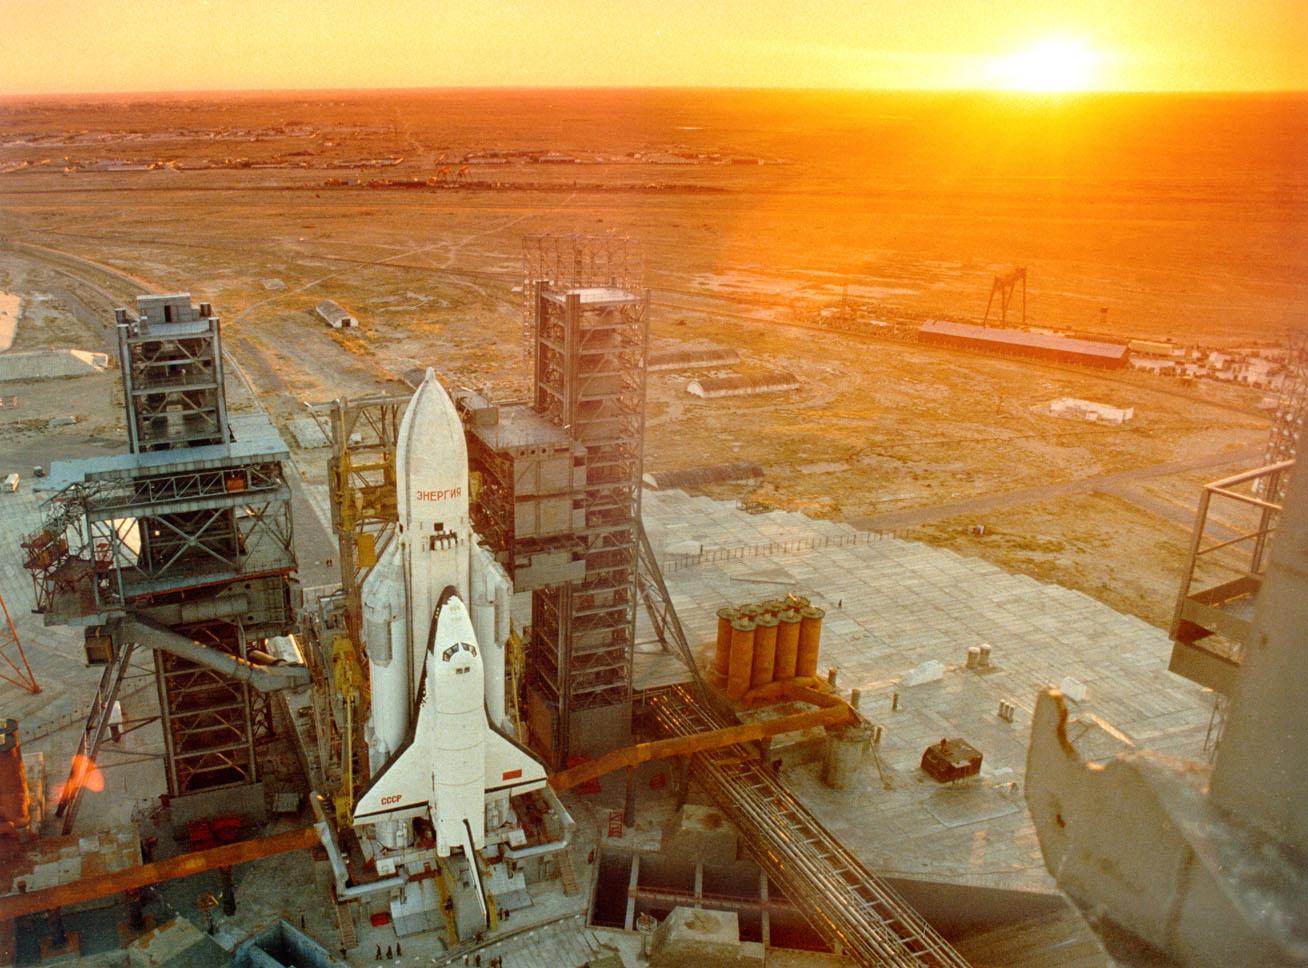 navette spatiale russe buran pas de tir decollage 09 Buran, la navette spatiale Russe